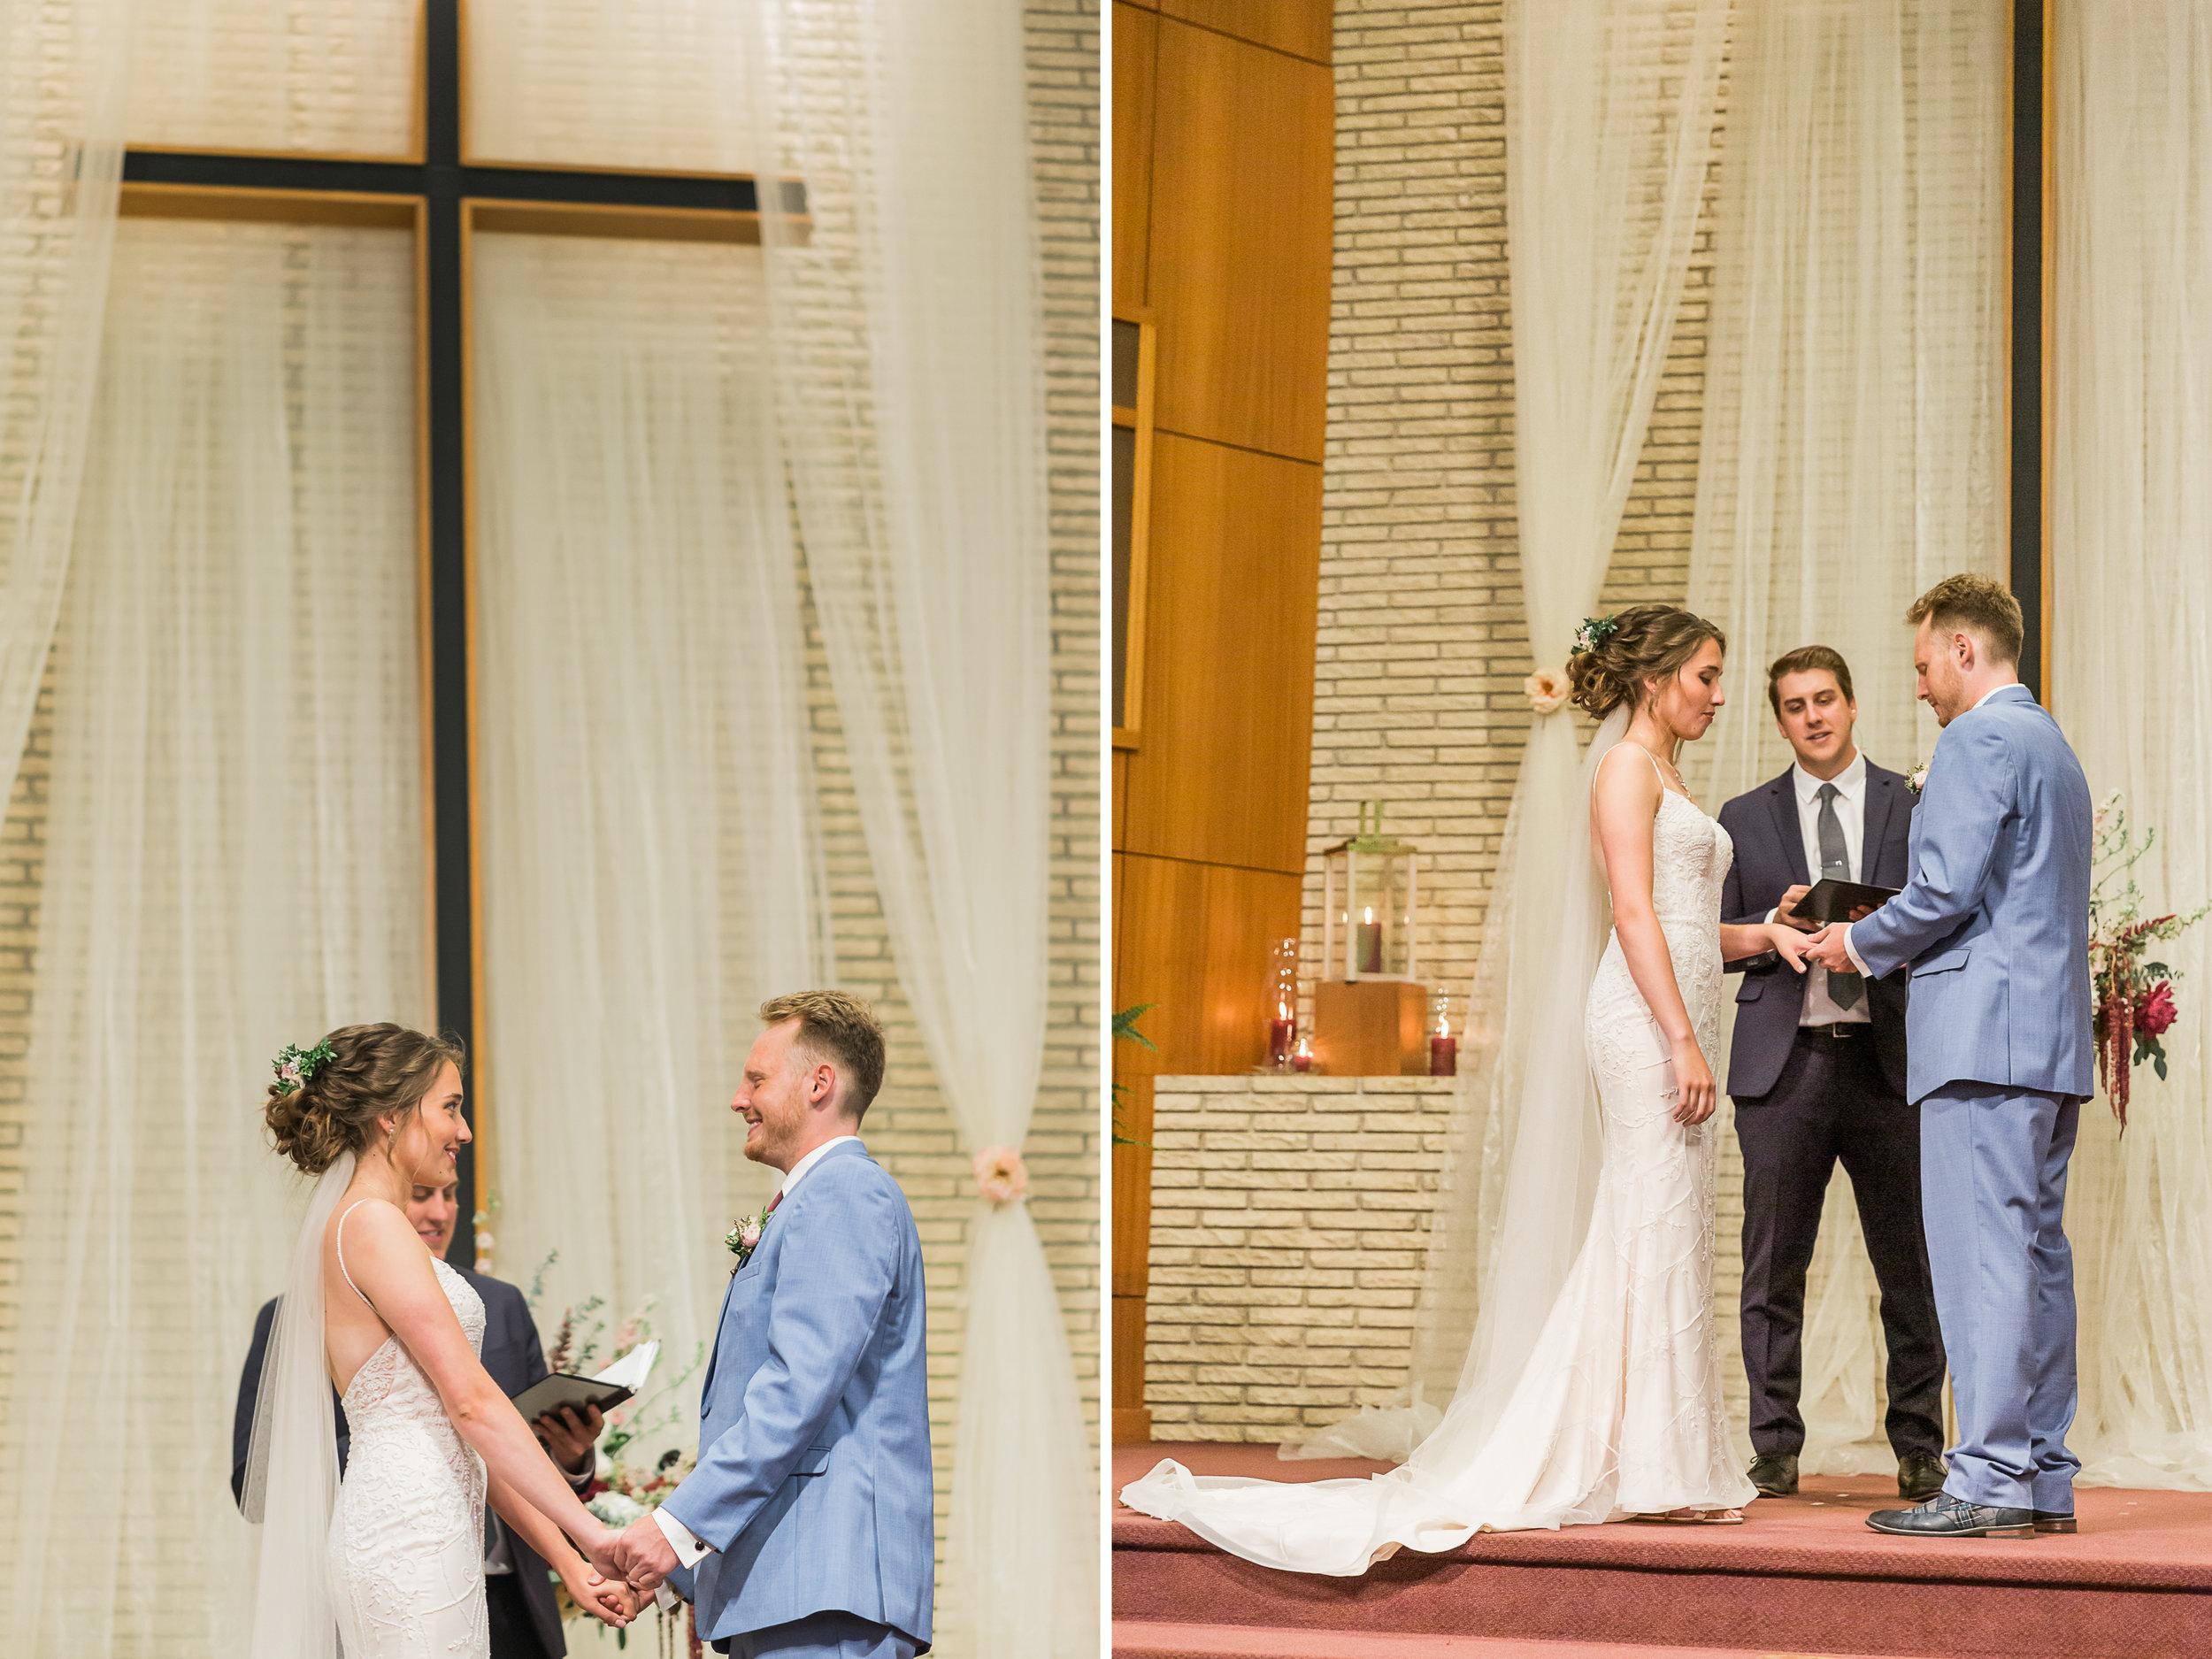 calebclairewedding-11.jpg